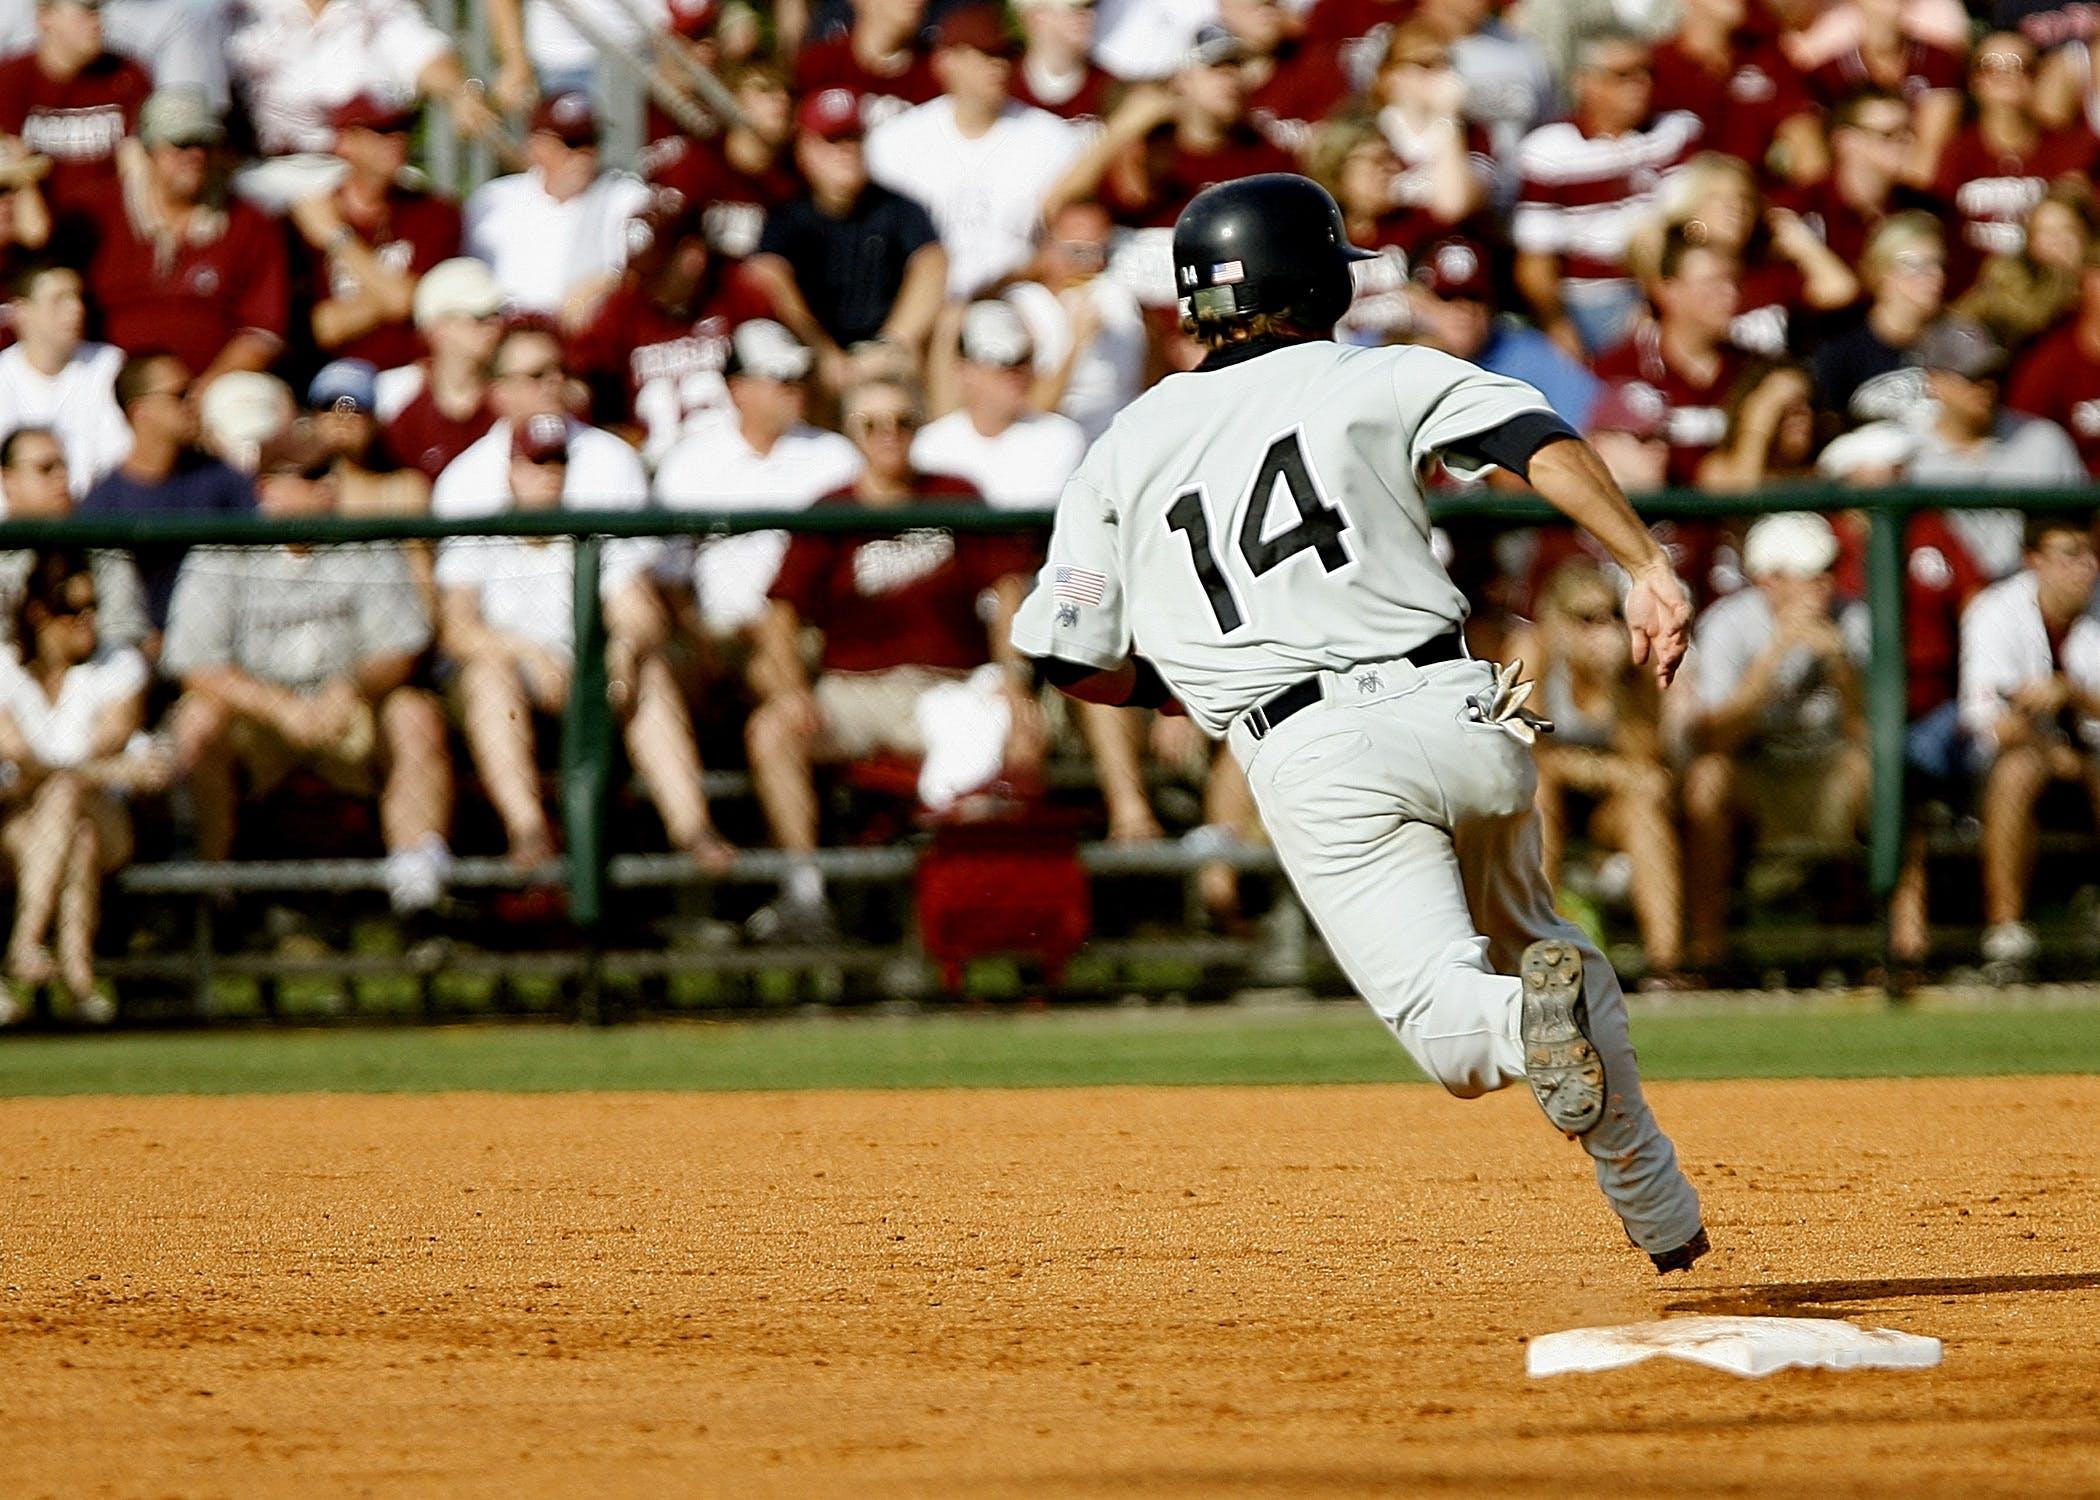 Baseball Player Number 14 Chasing Goal on Baseball Field